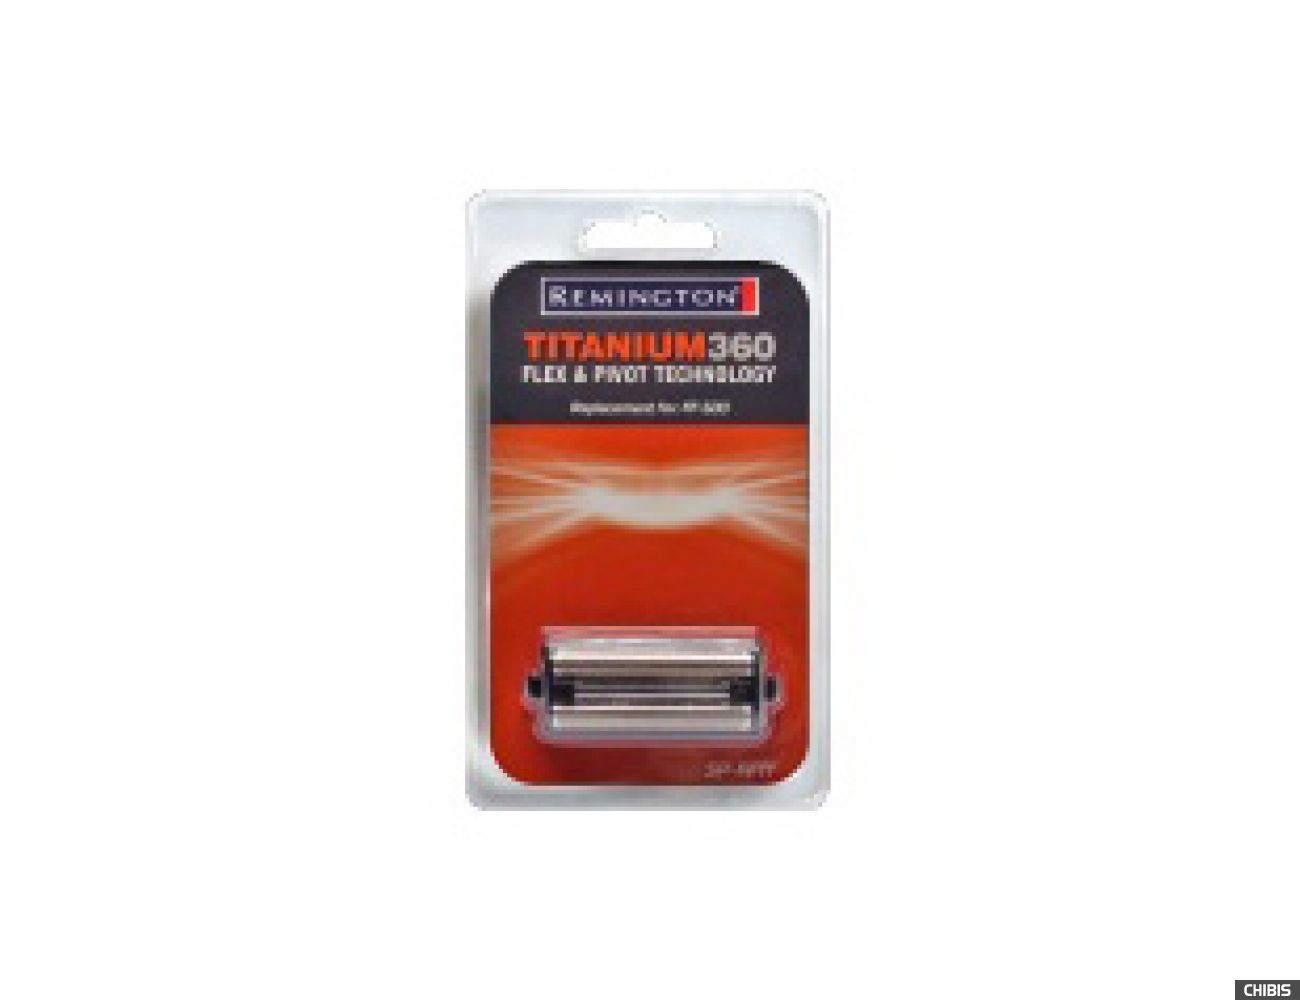 Сетка Remington SPFFTf Titanium 360 (44087530400) для FF-500